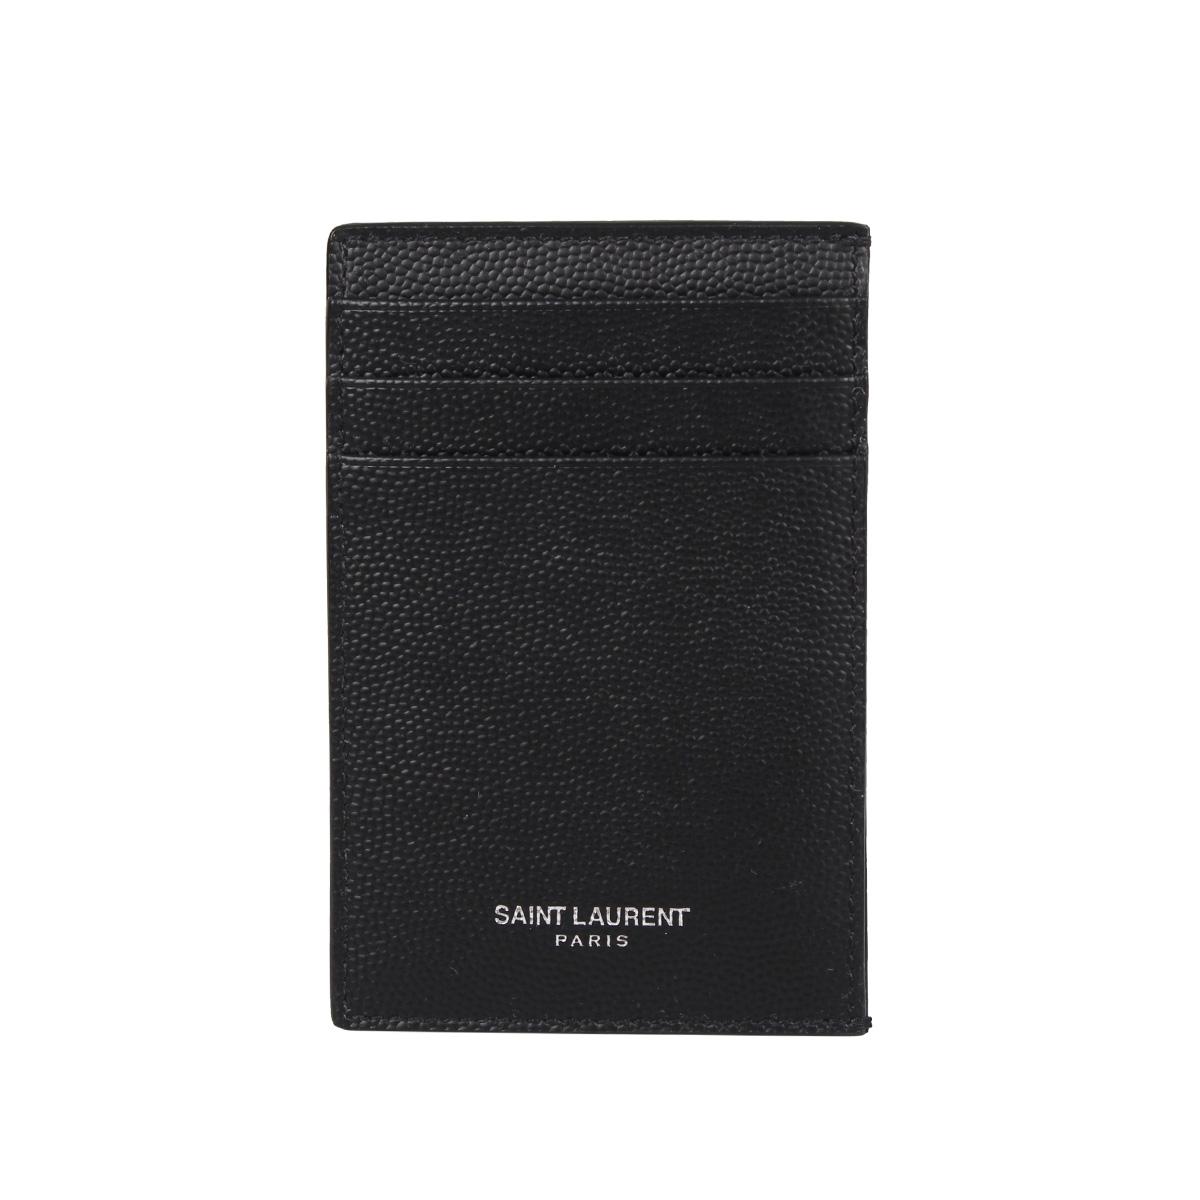 SAINT LAURENT PARIS METAL-CLIP CARDHOLDER サンローラン パリ パスケース カードケース ID 定期入れ メンズ ブラック 黒 584105BTY0N